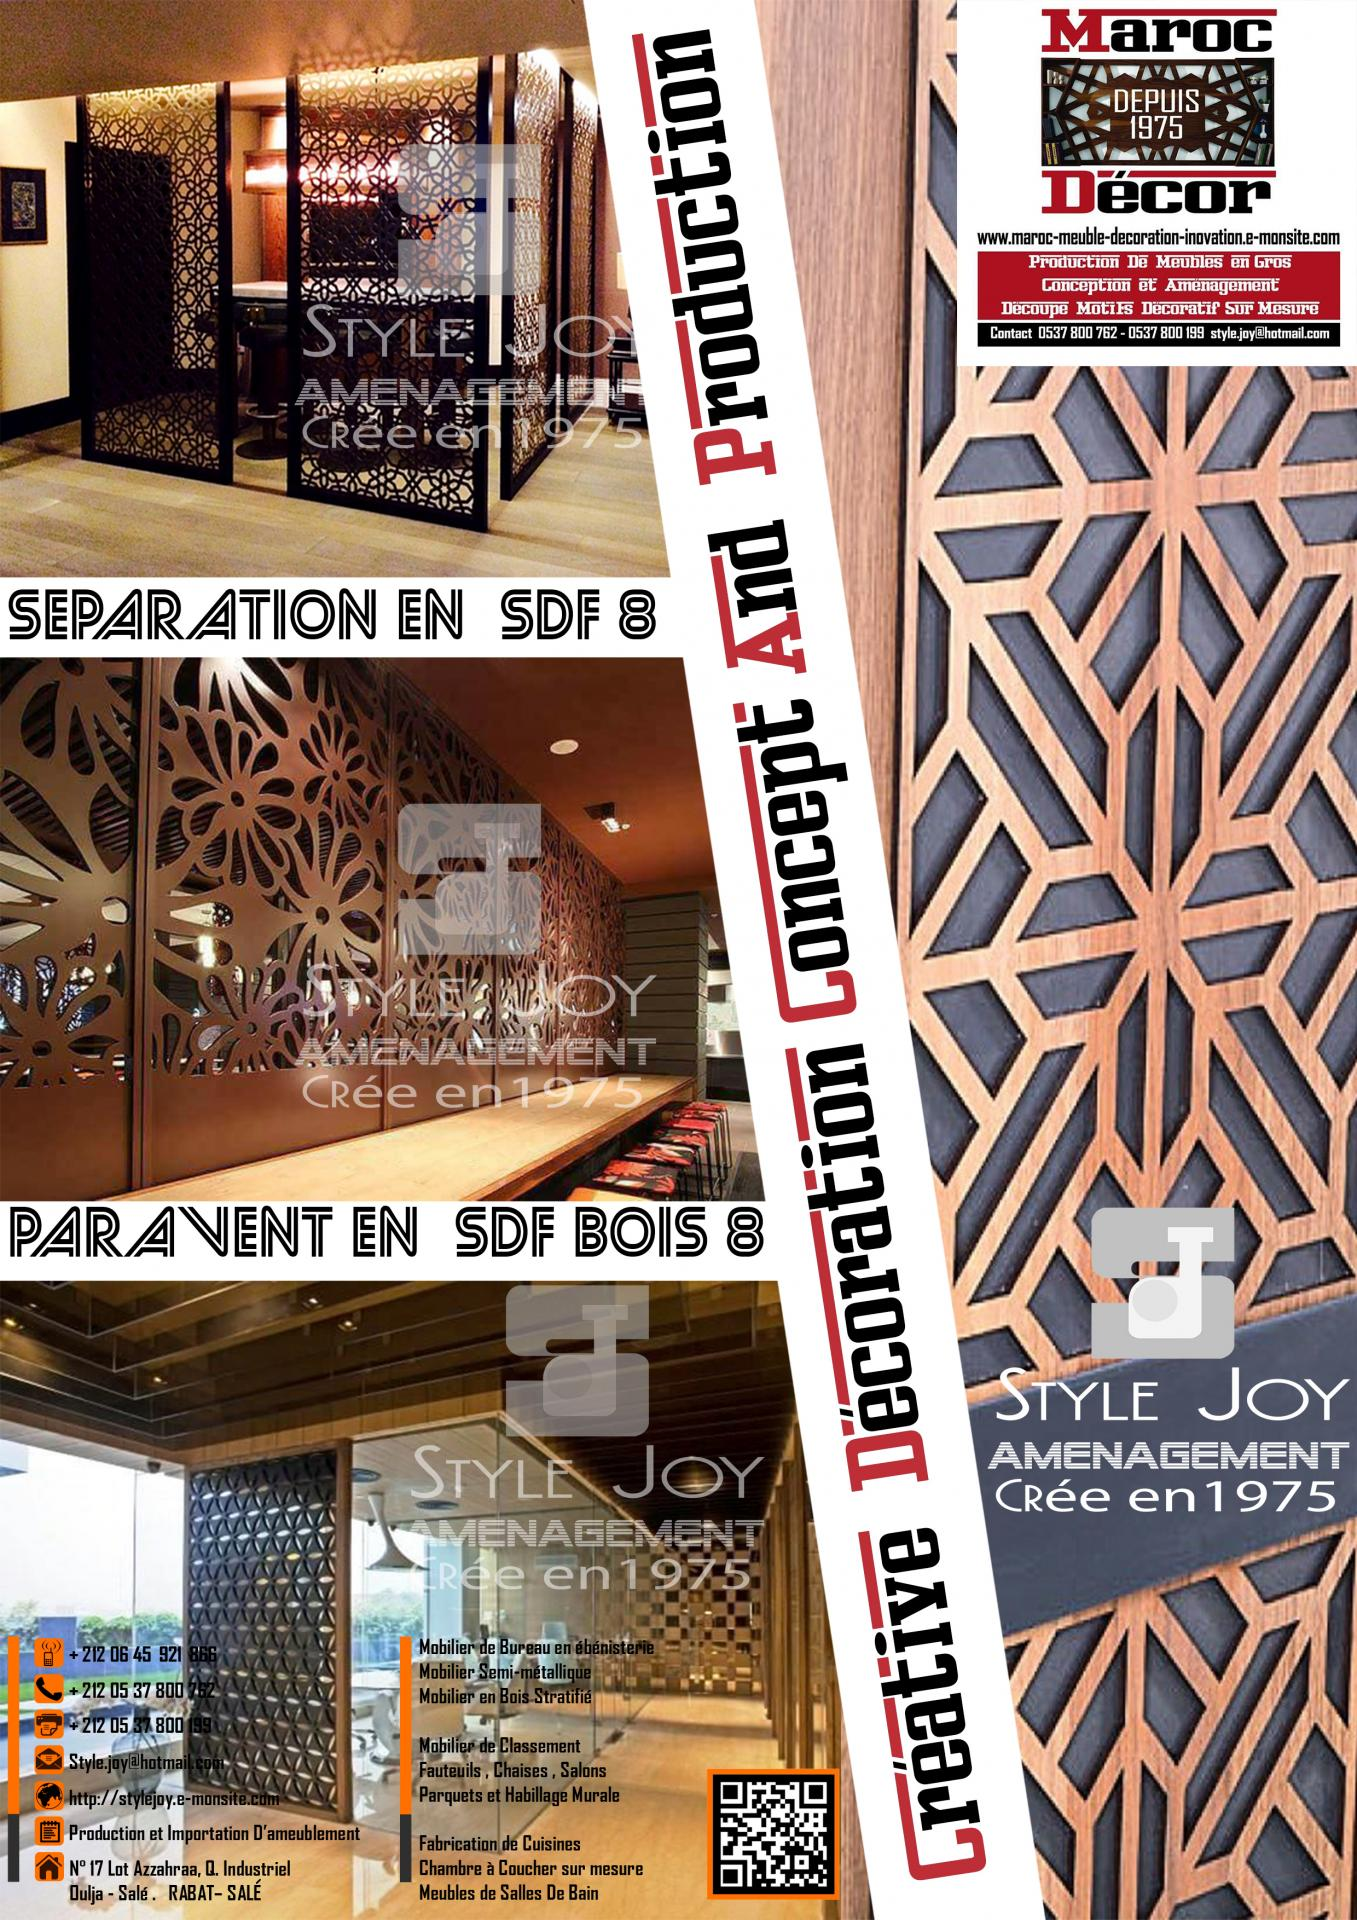 Salle De Bain Josephine Baker ~ N 1 En Mobilier Bureau Rabat Casablanca Deco Inovation Meuble Rabat